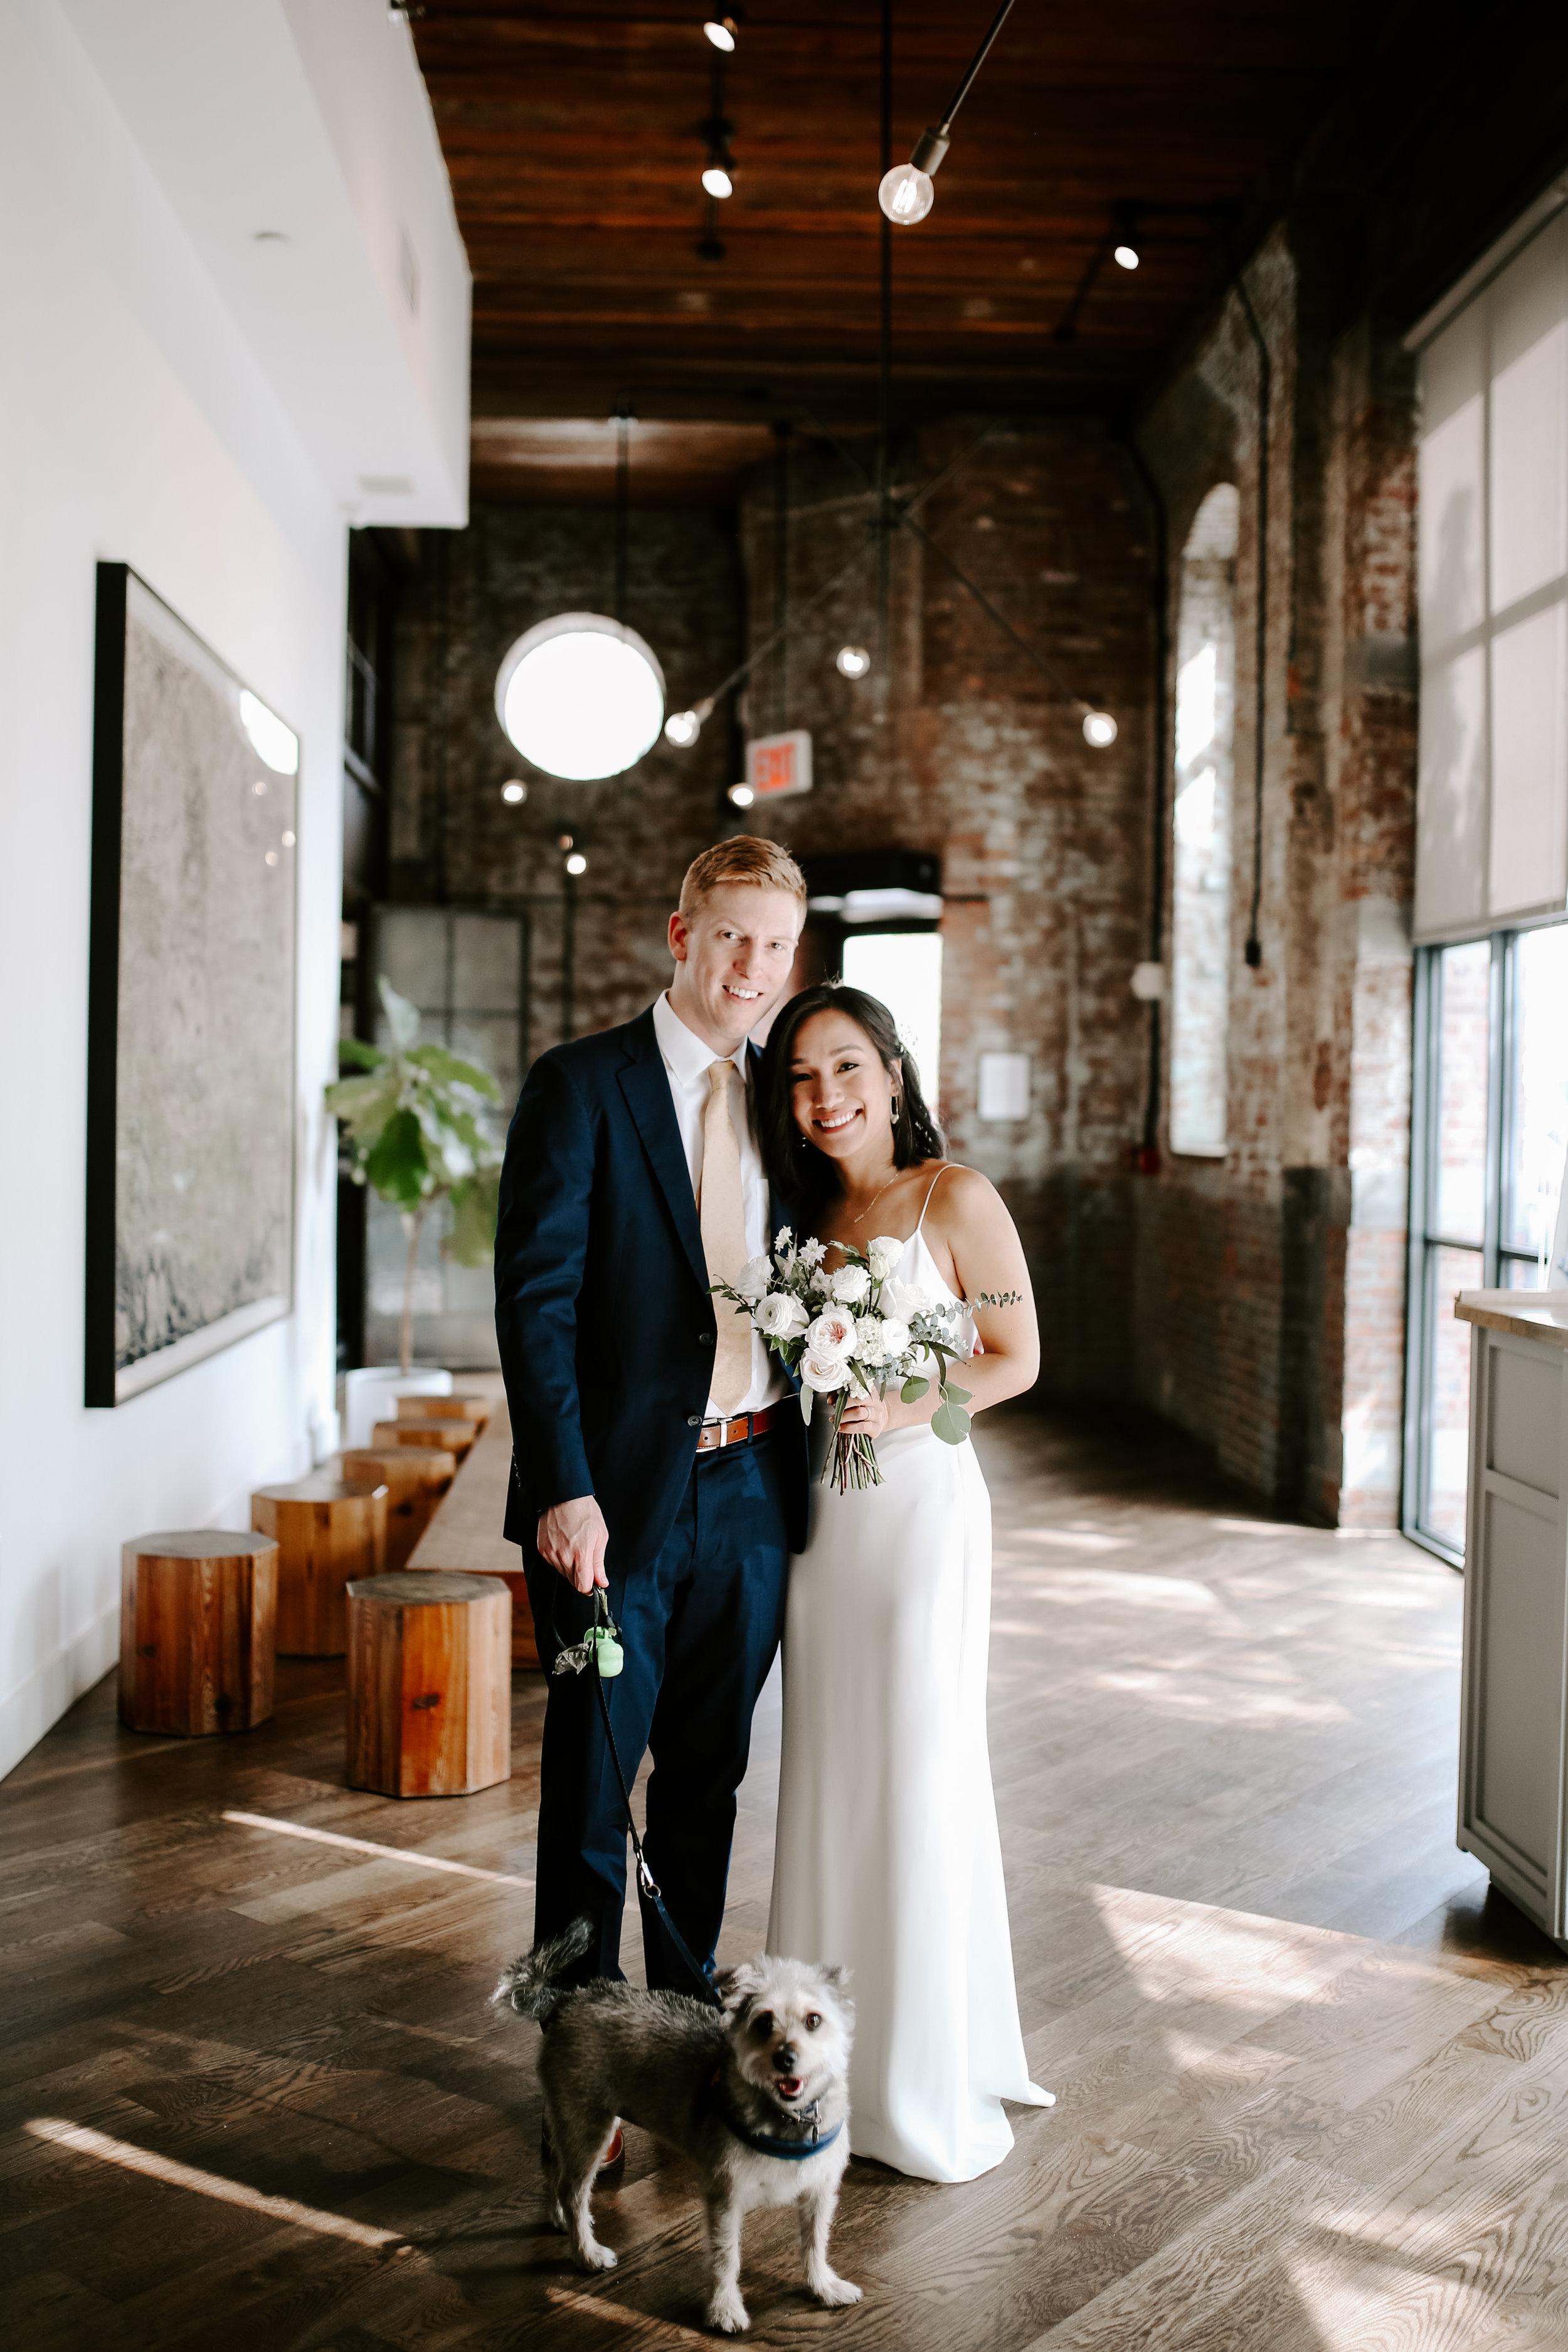 TheNichols_Married_2019-1-64.jpg